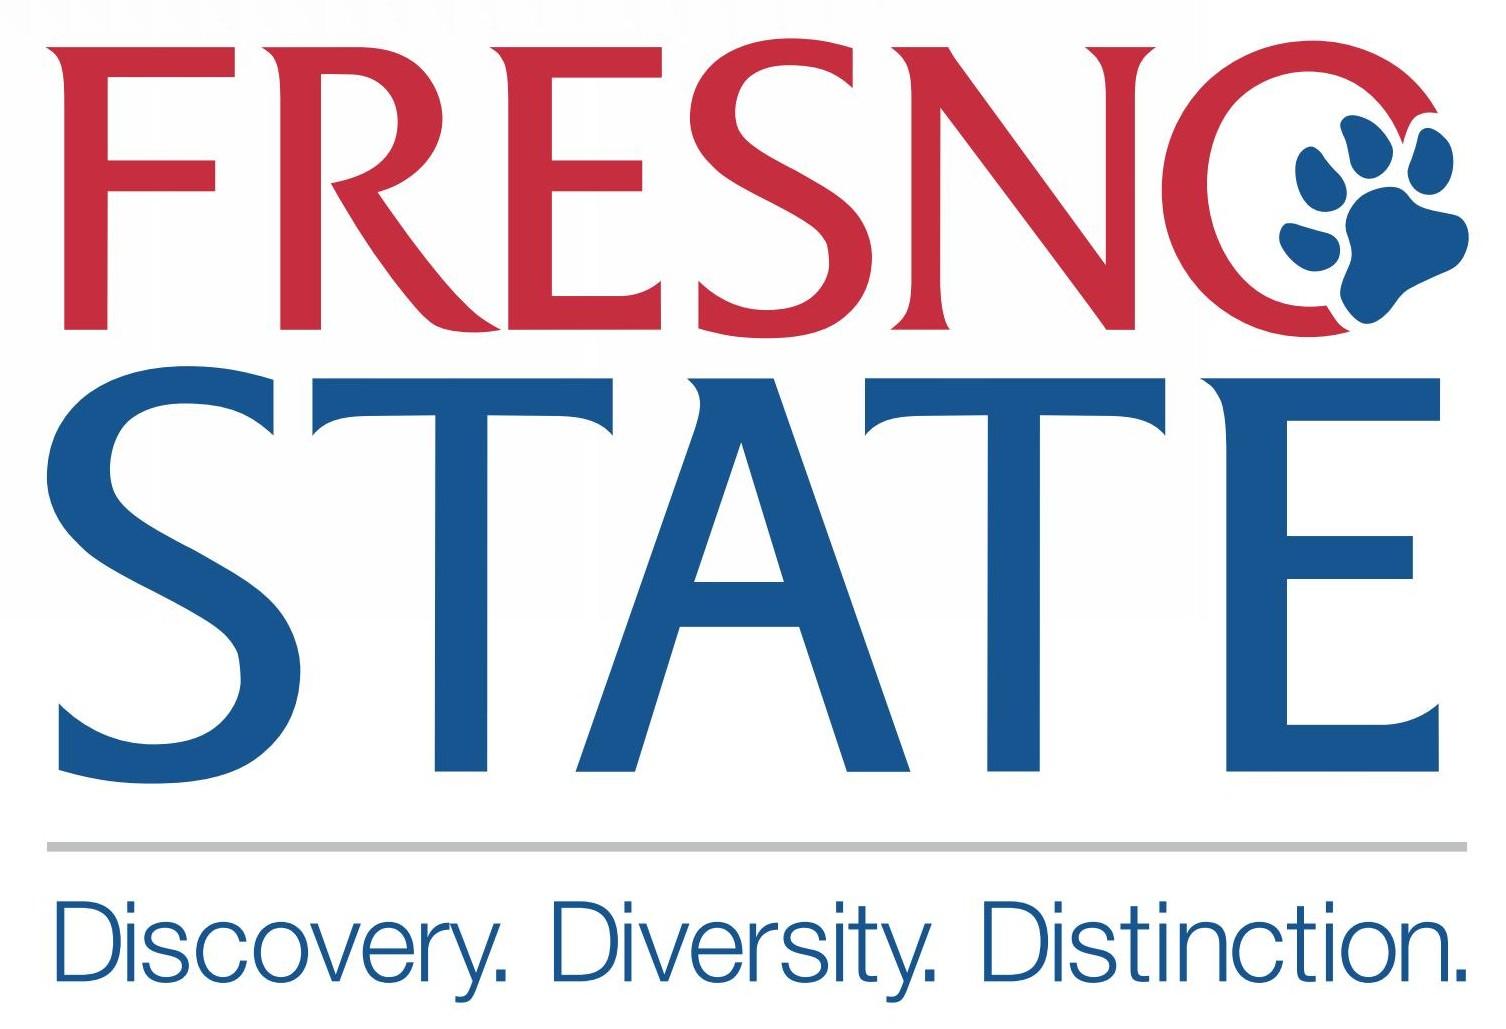 Fresno state clipart logo jpg freeuse download Fresno state clipart logo jpg - ClipartFest freeuse download